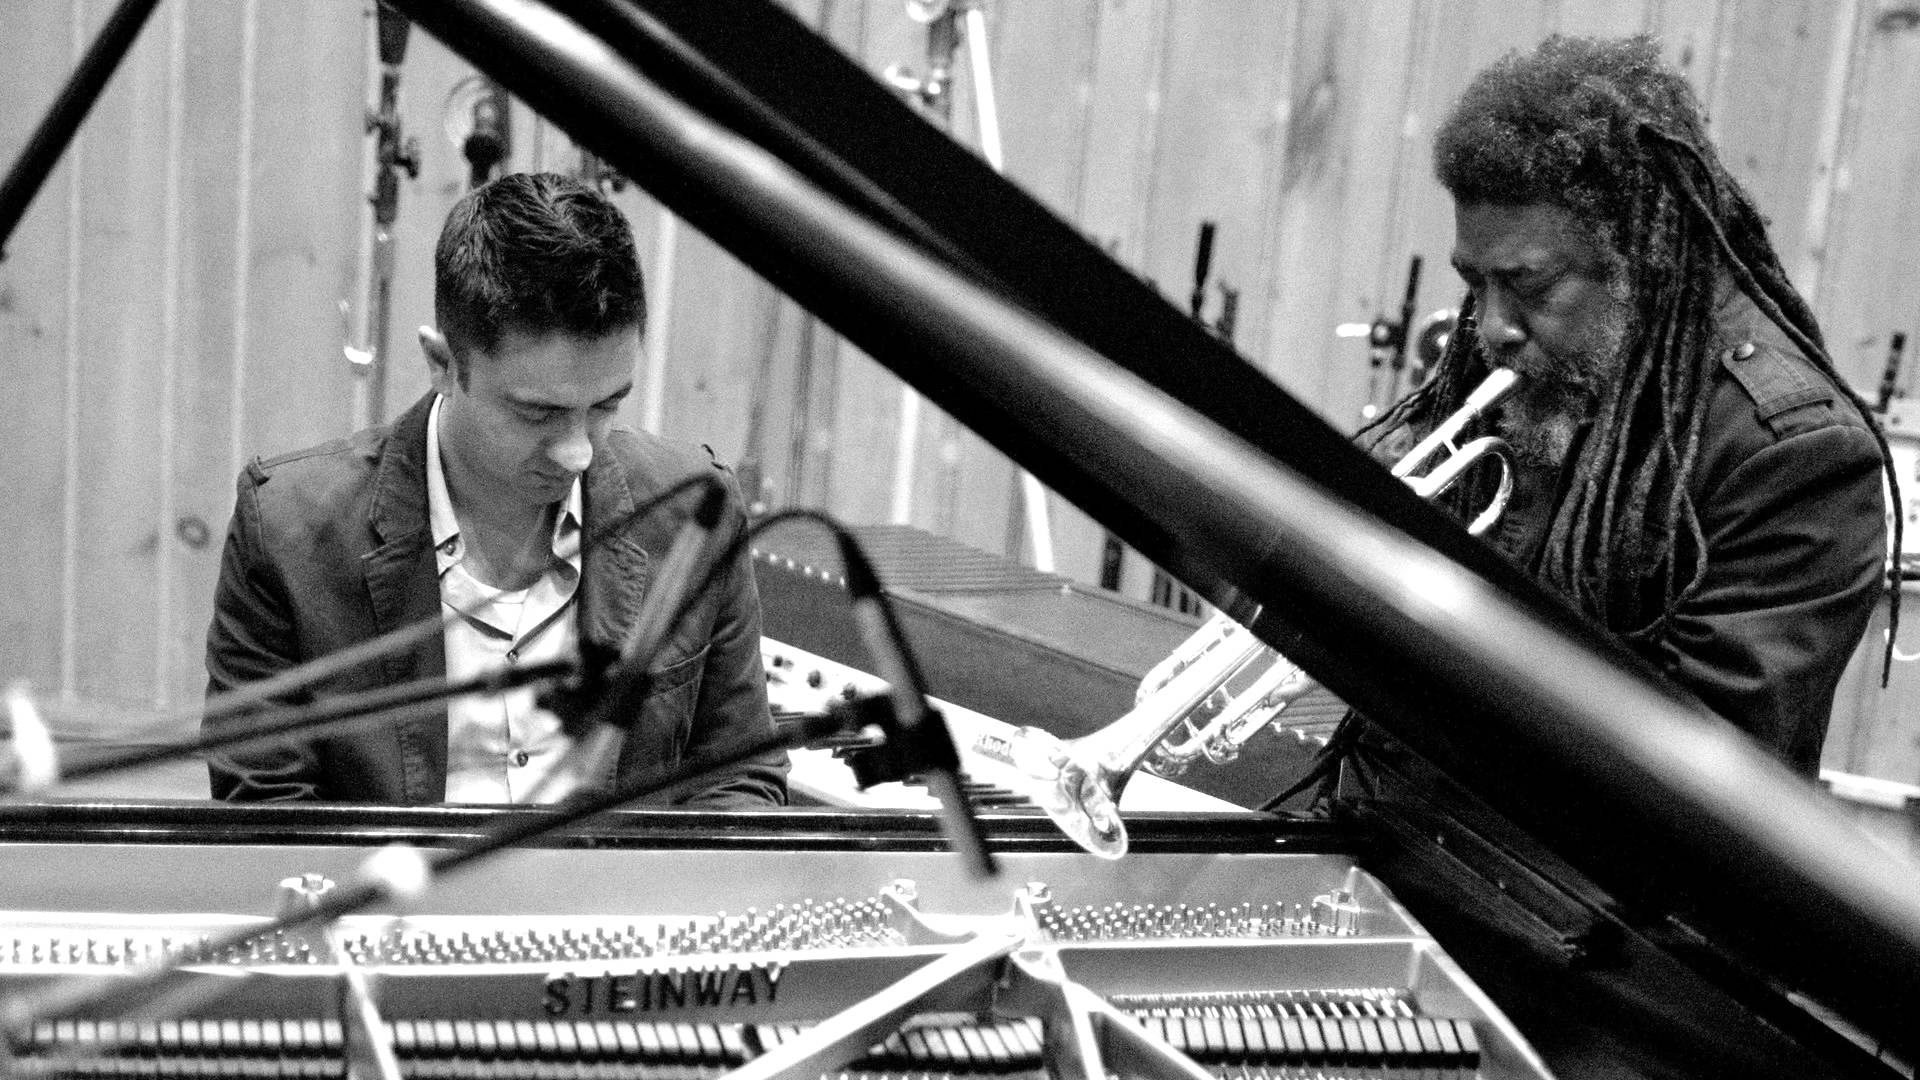 Vijay Iyer & Wadada Leo Smith, recording session for A Cosmic Rhythm with Each Stroke, 2015. Photo by John Rogers.